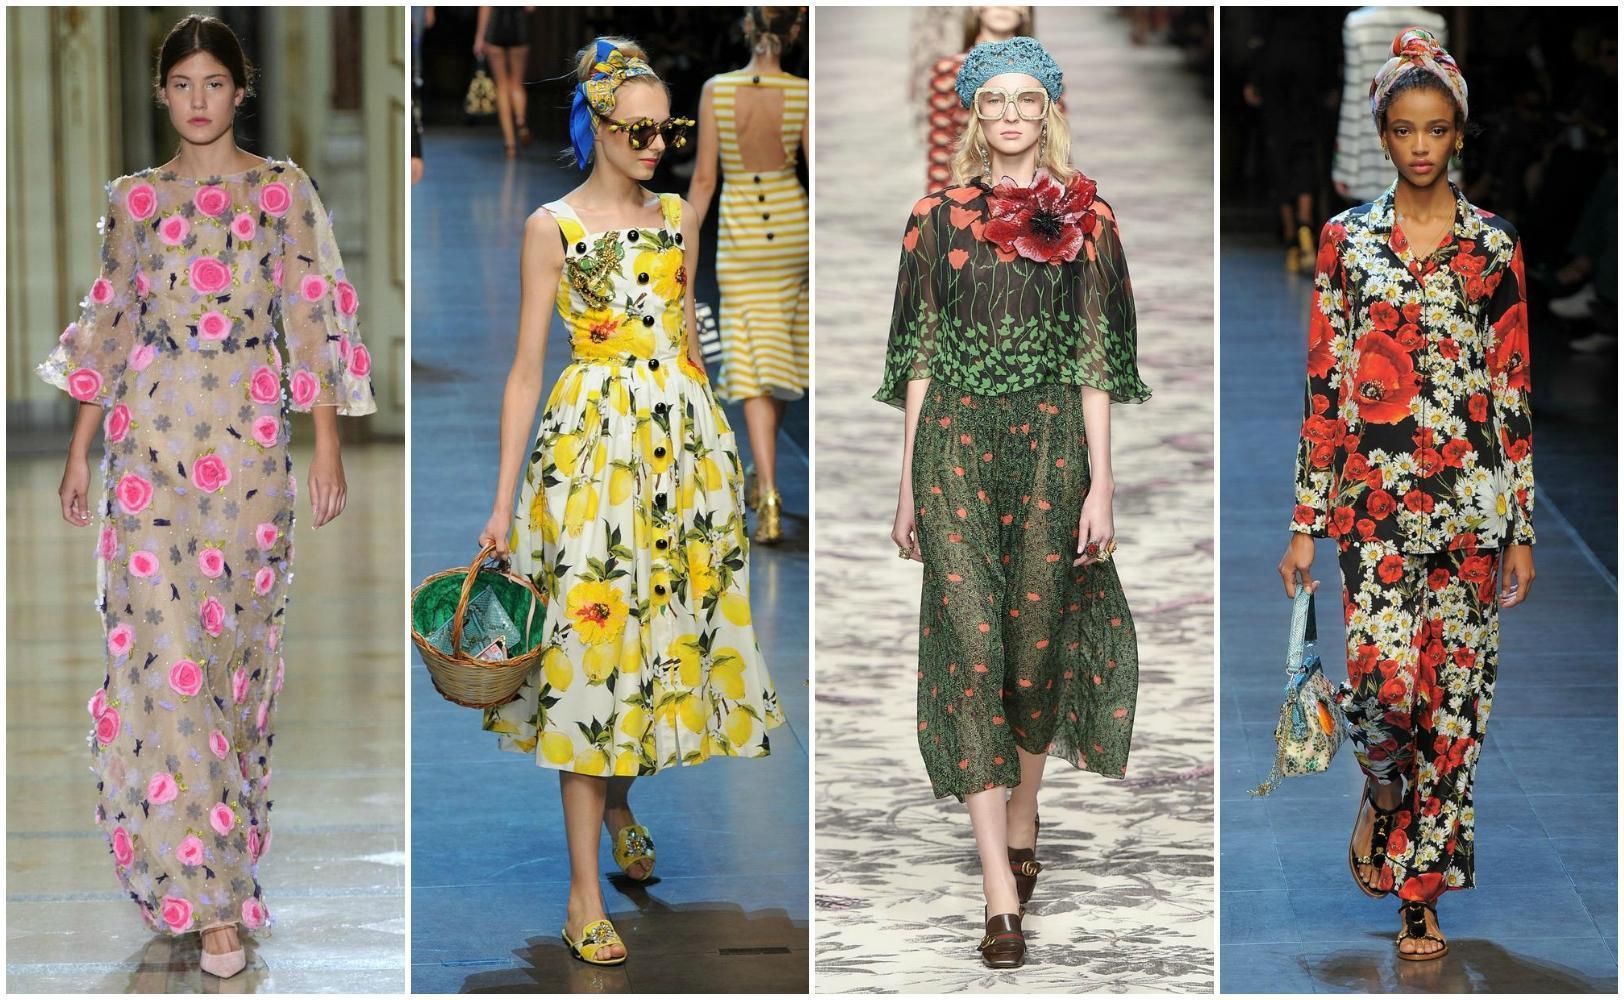 Gucci Spring Floral Dresses